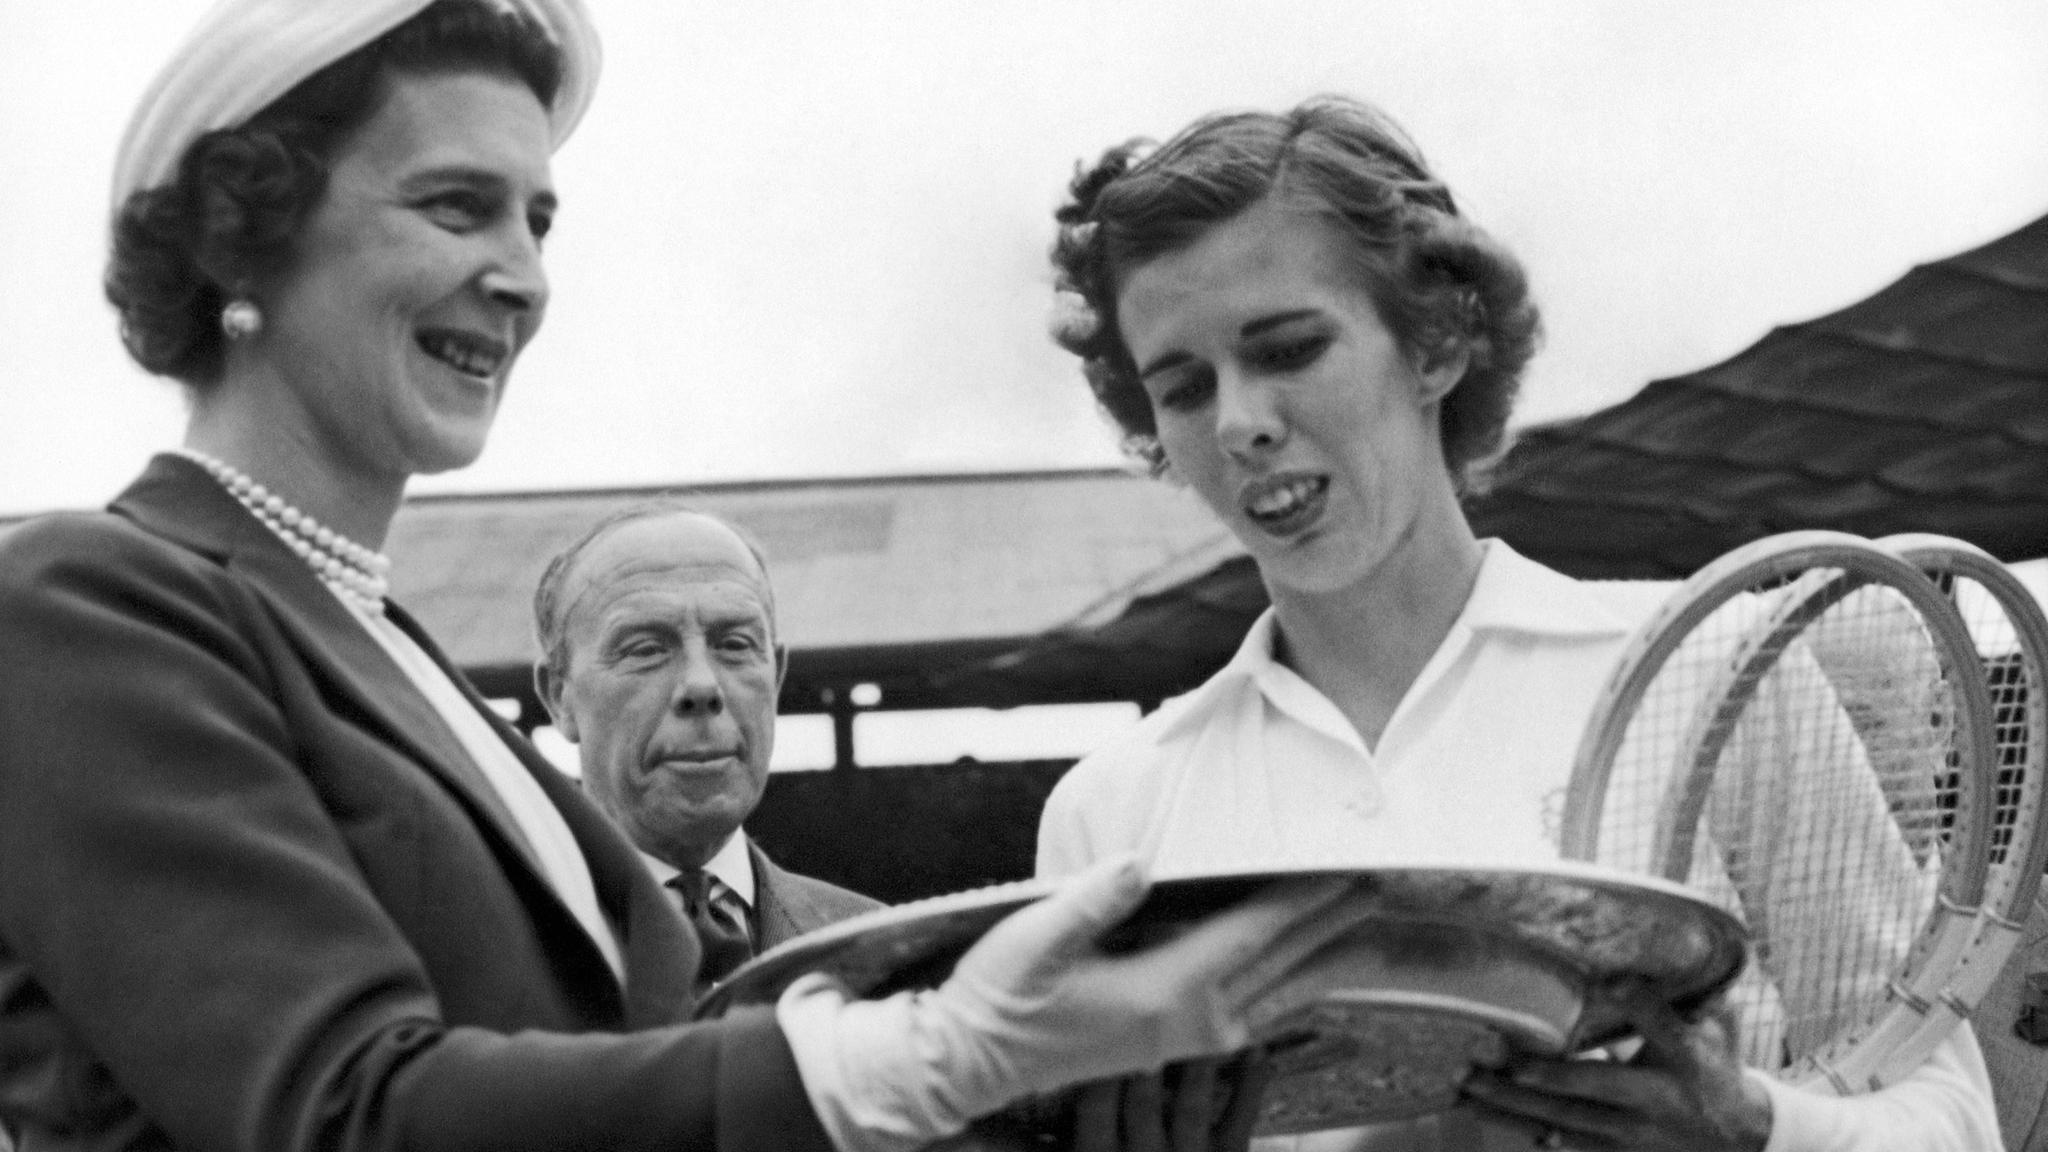 Doris Hart tennis champion 1925 2015